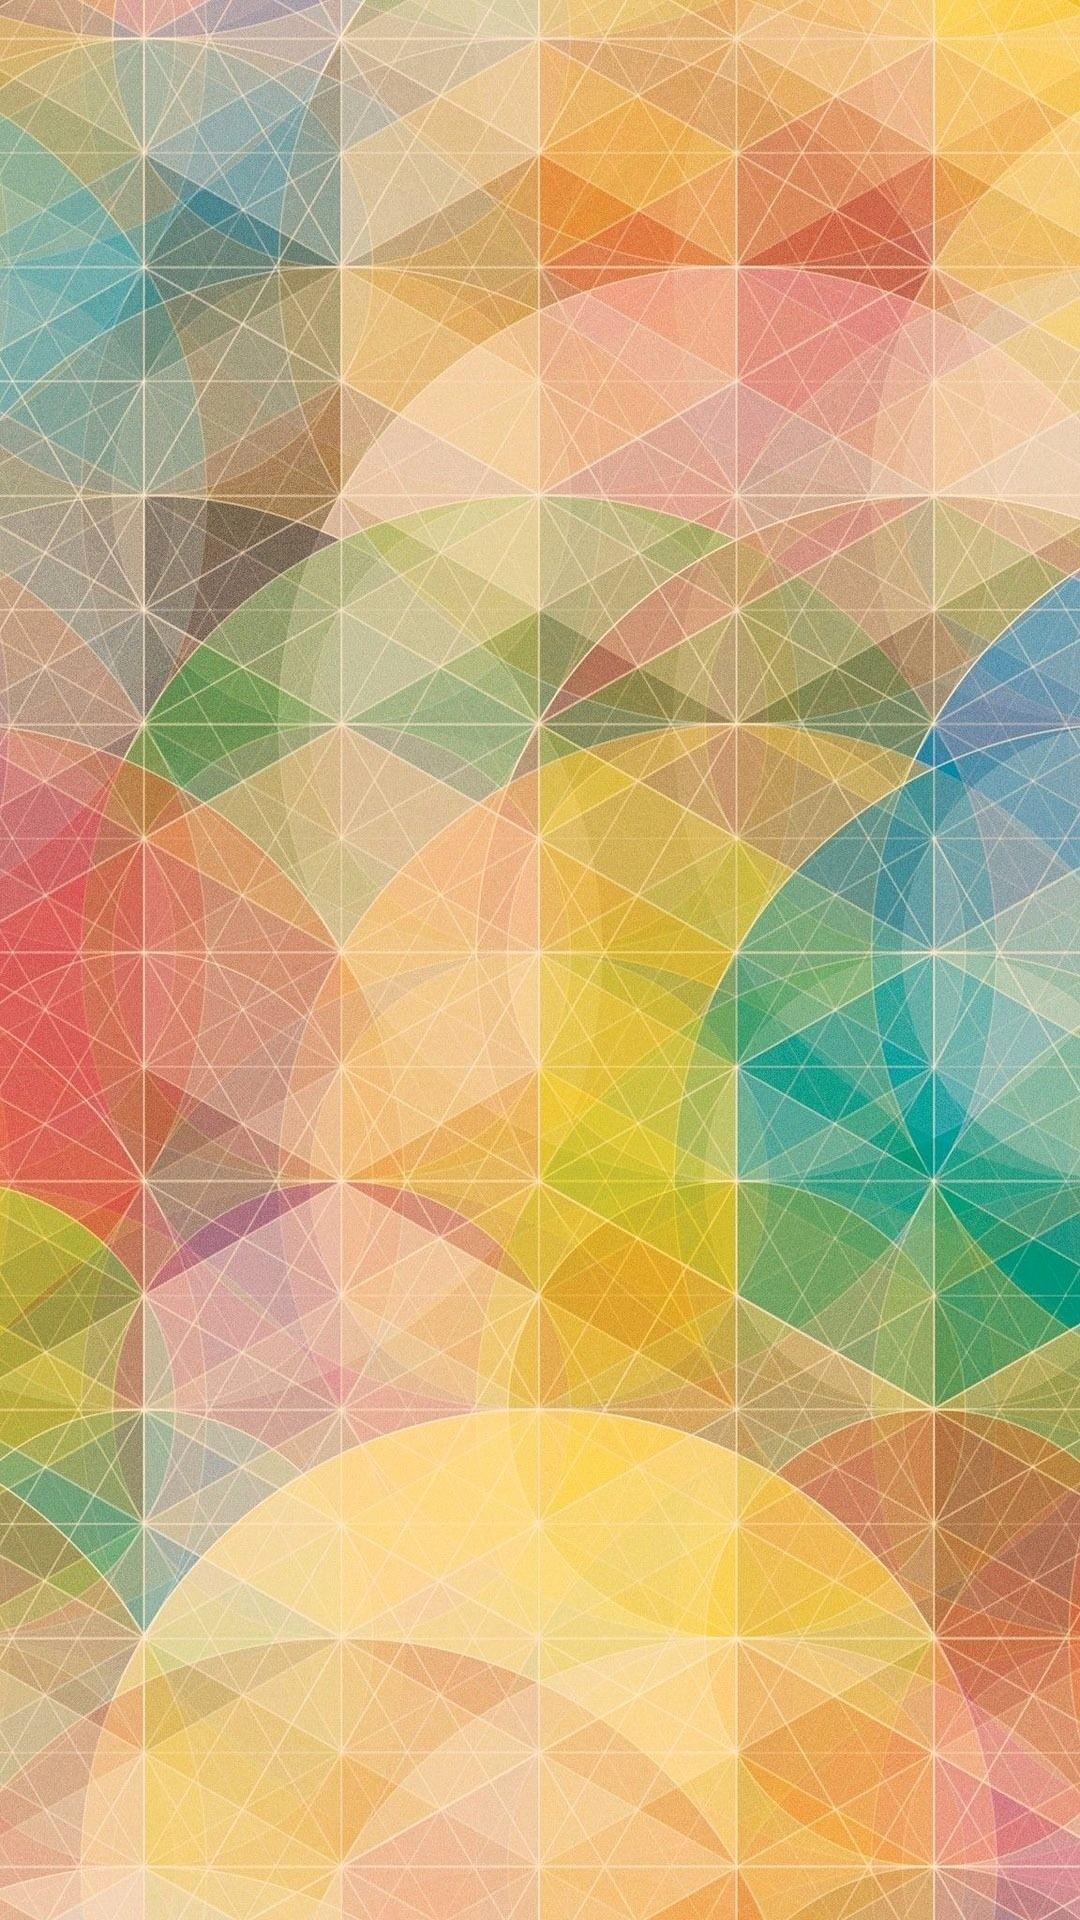 Geometric phone wallpaper hd